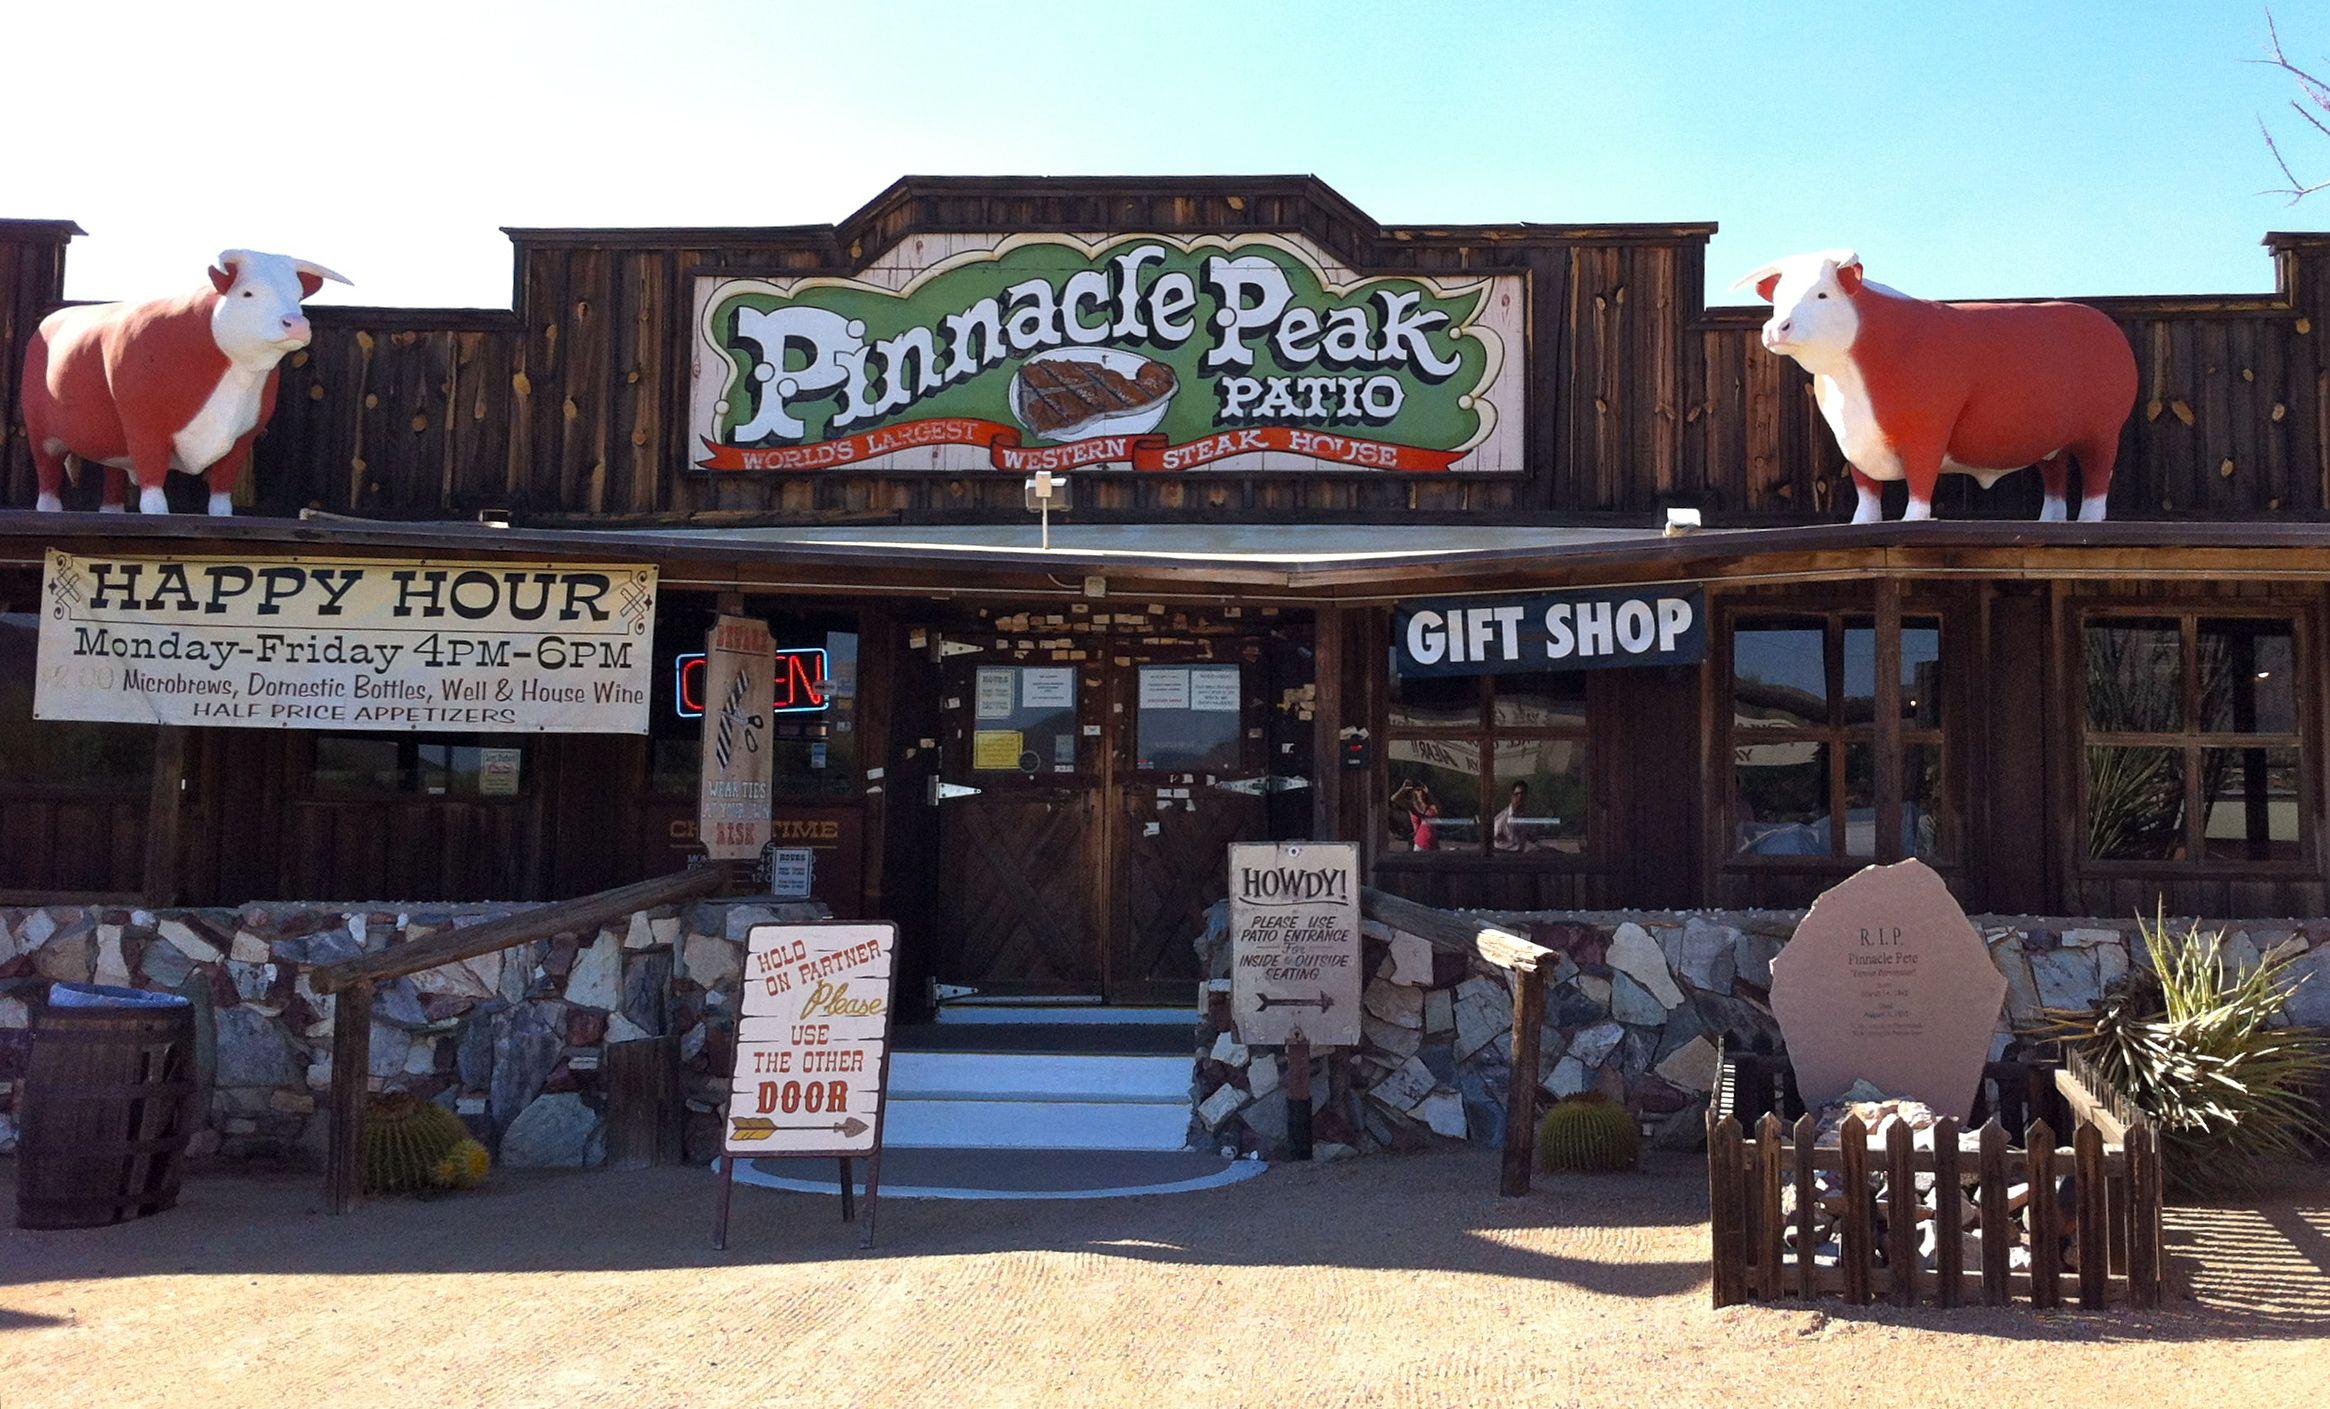 Delightful Pinnacle Peak Patio Steakhouse In Scottsdale, AZ